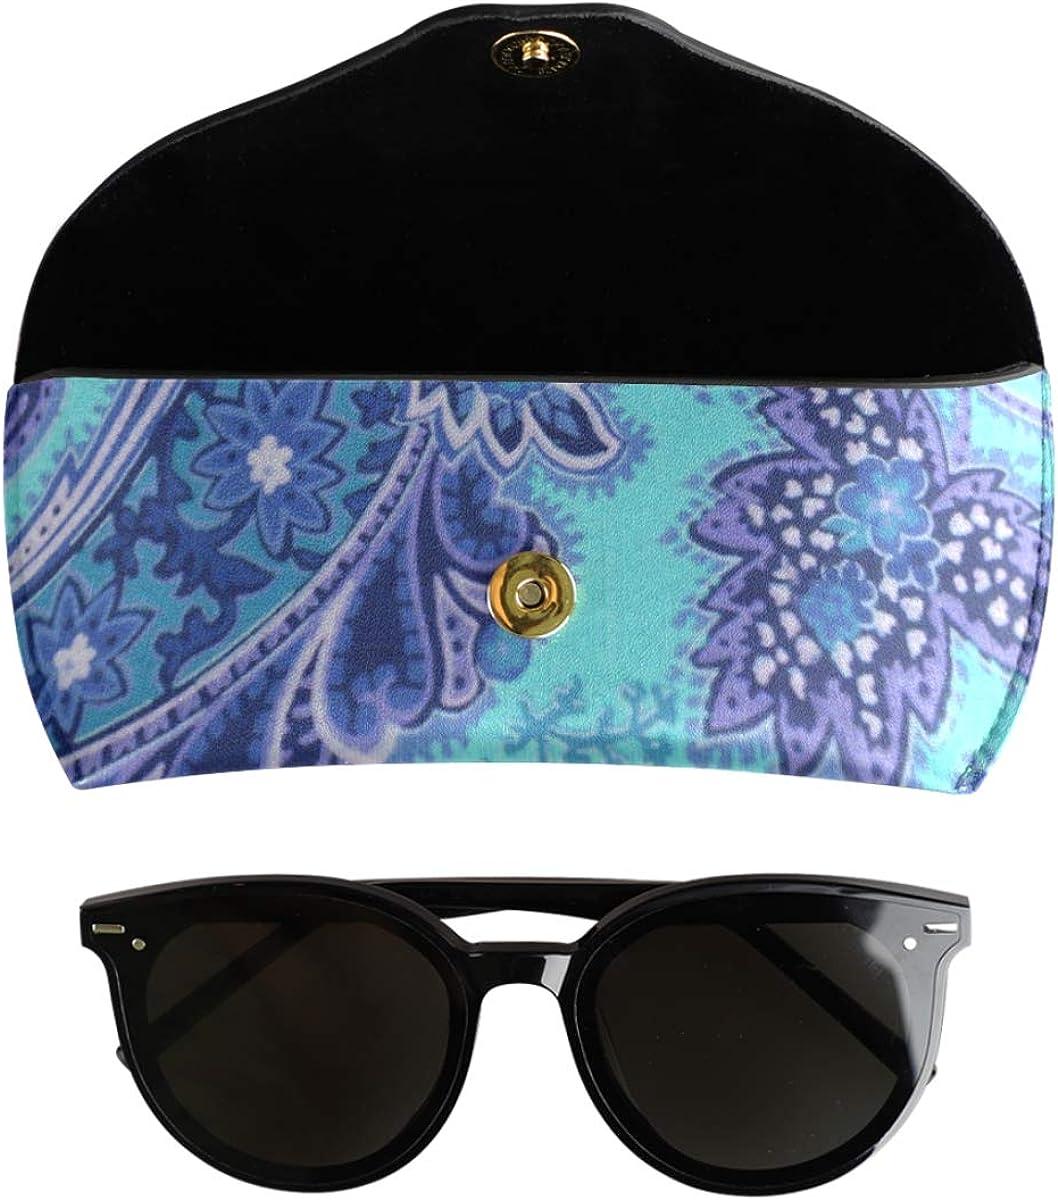 Portable Wallet PU Leather Goggles Bag Art Flower Blue Paisley Multiuse Sunglasses Case Eyeglasses Pouch